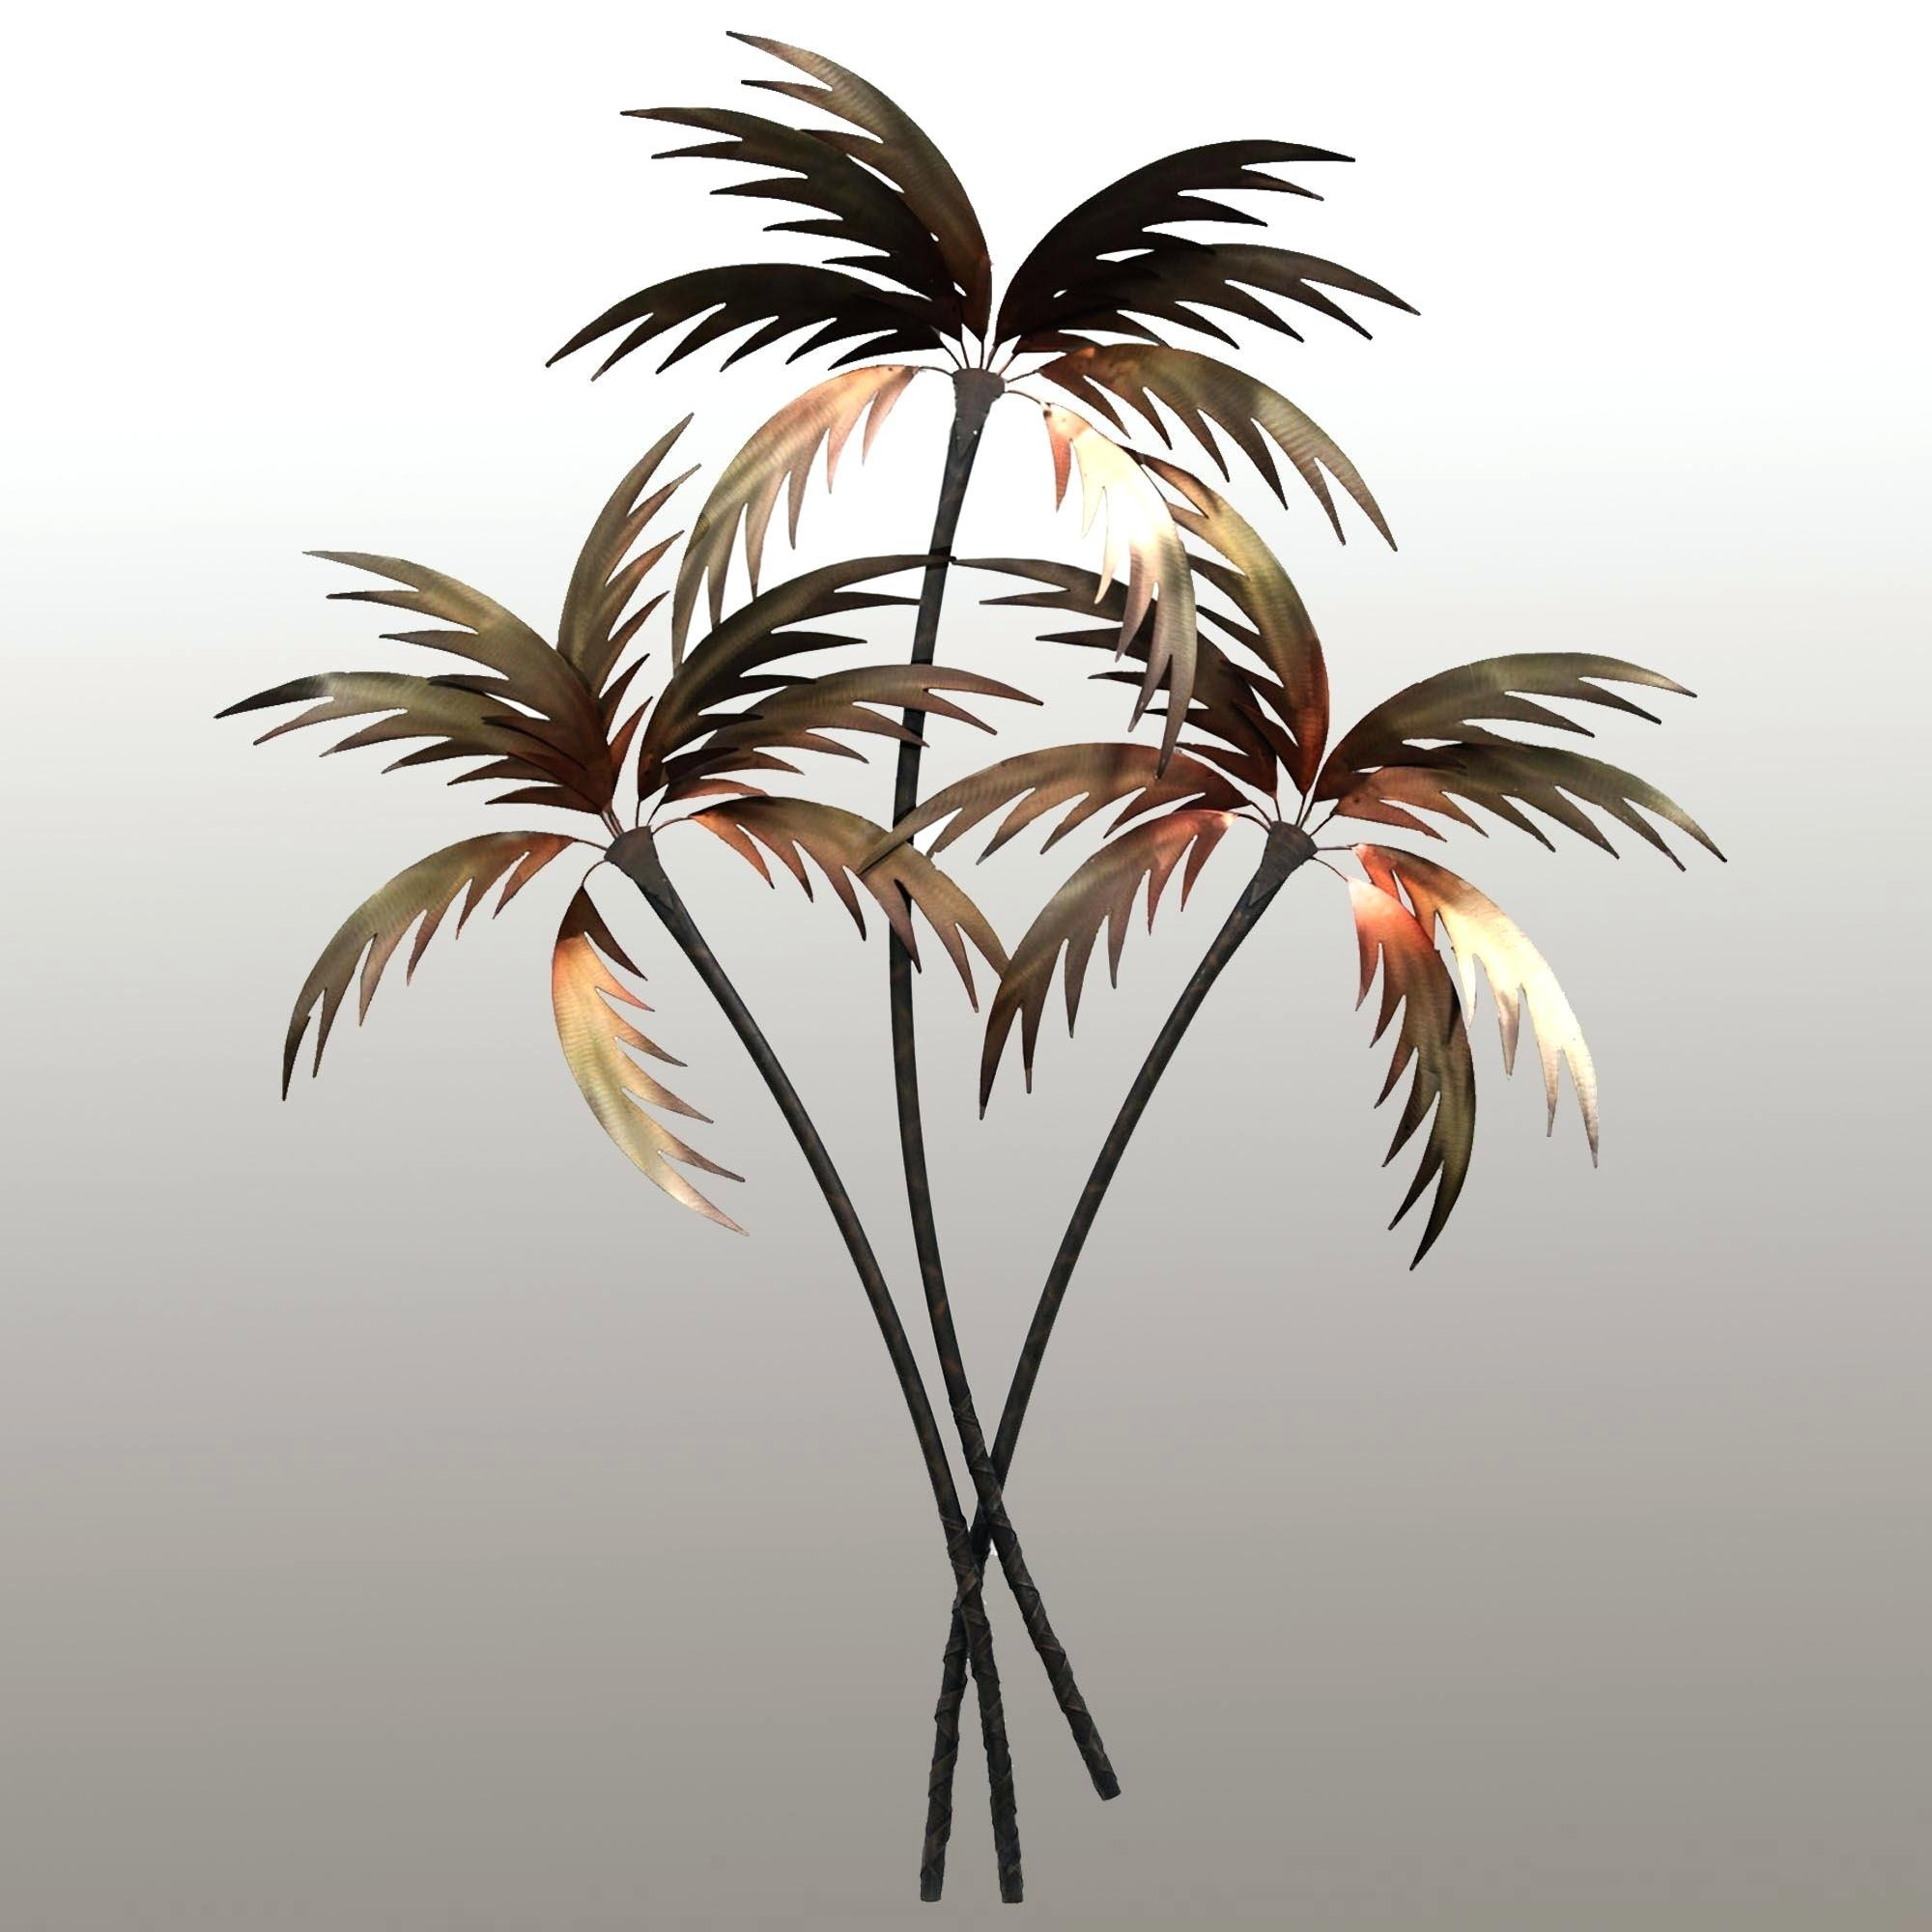 Wall Ideas : Outdoor Metal Wall Art Palm Tree Tropical Metal Wall With Palm Tree Metal Wall Art (View 11 of 20)